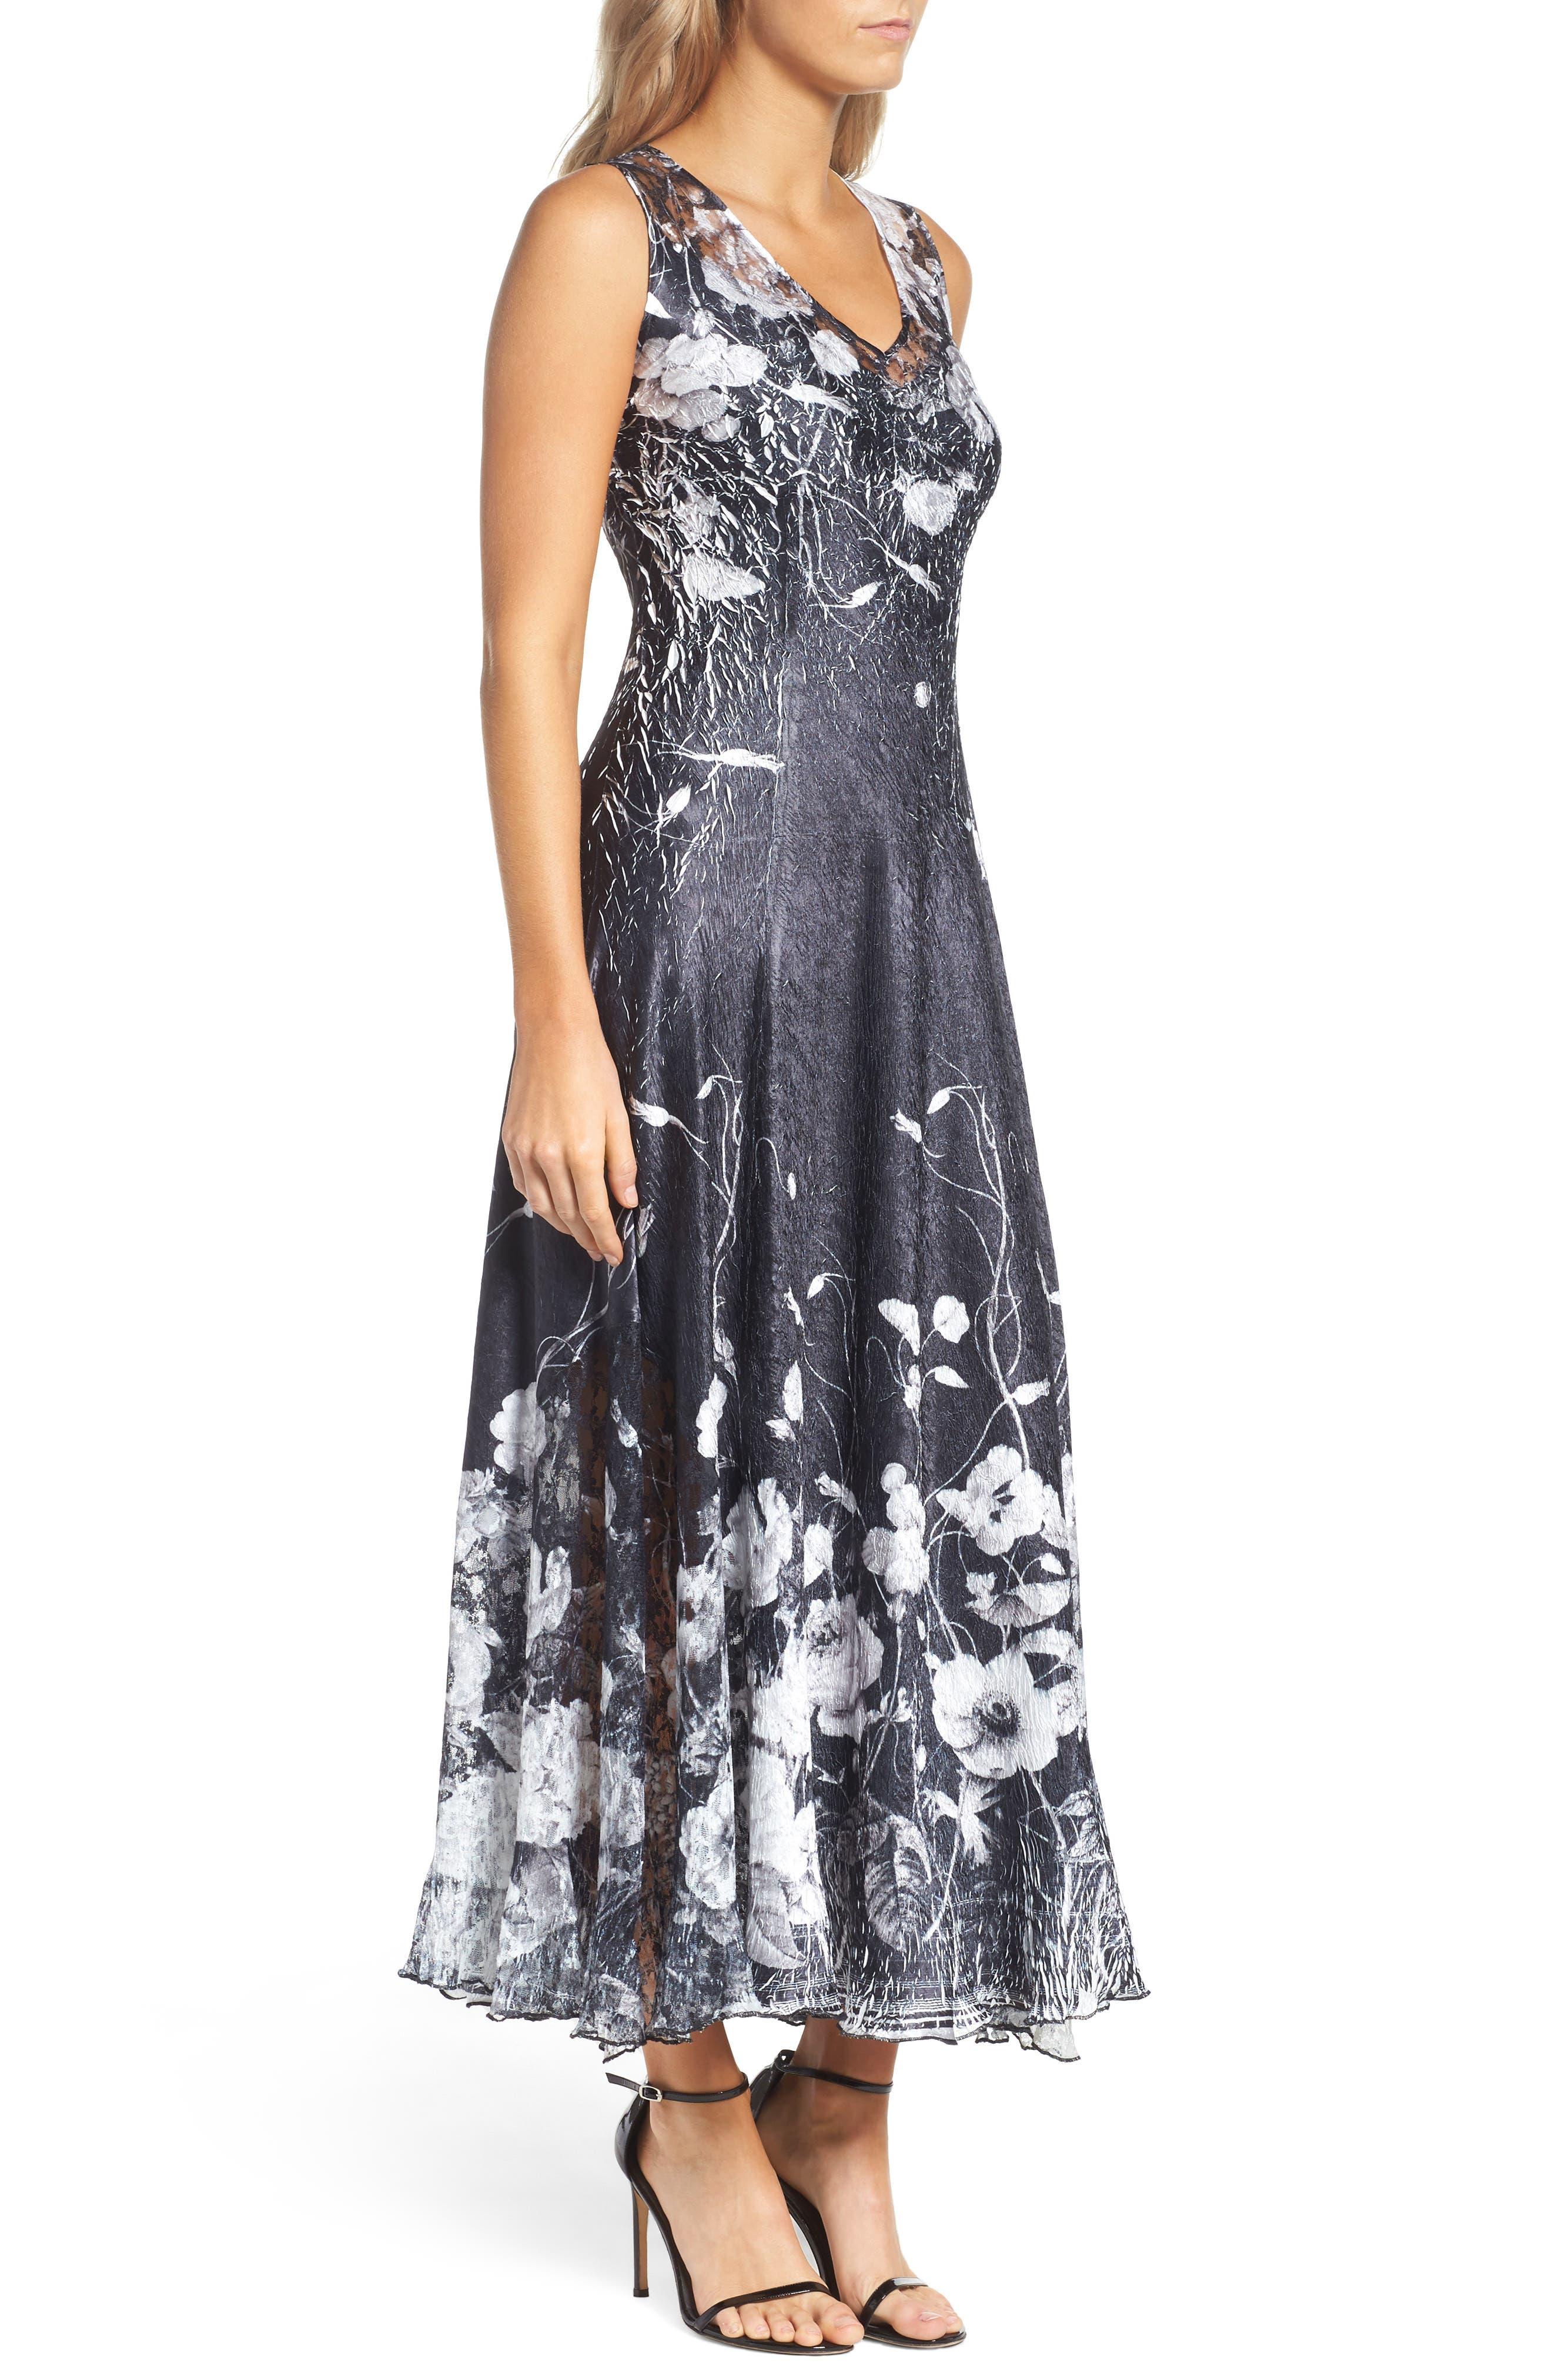 KOMAROV, Lace-Up Back Maxi Dress with Wrap, Alternate thumbnail 4, color, 001